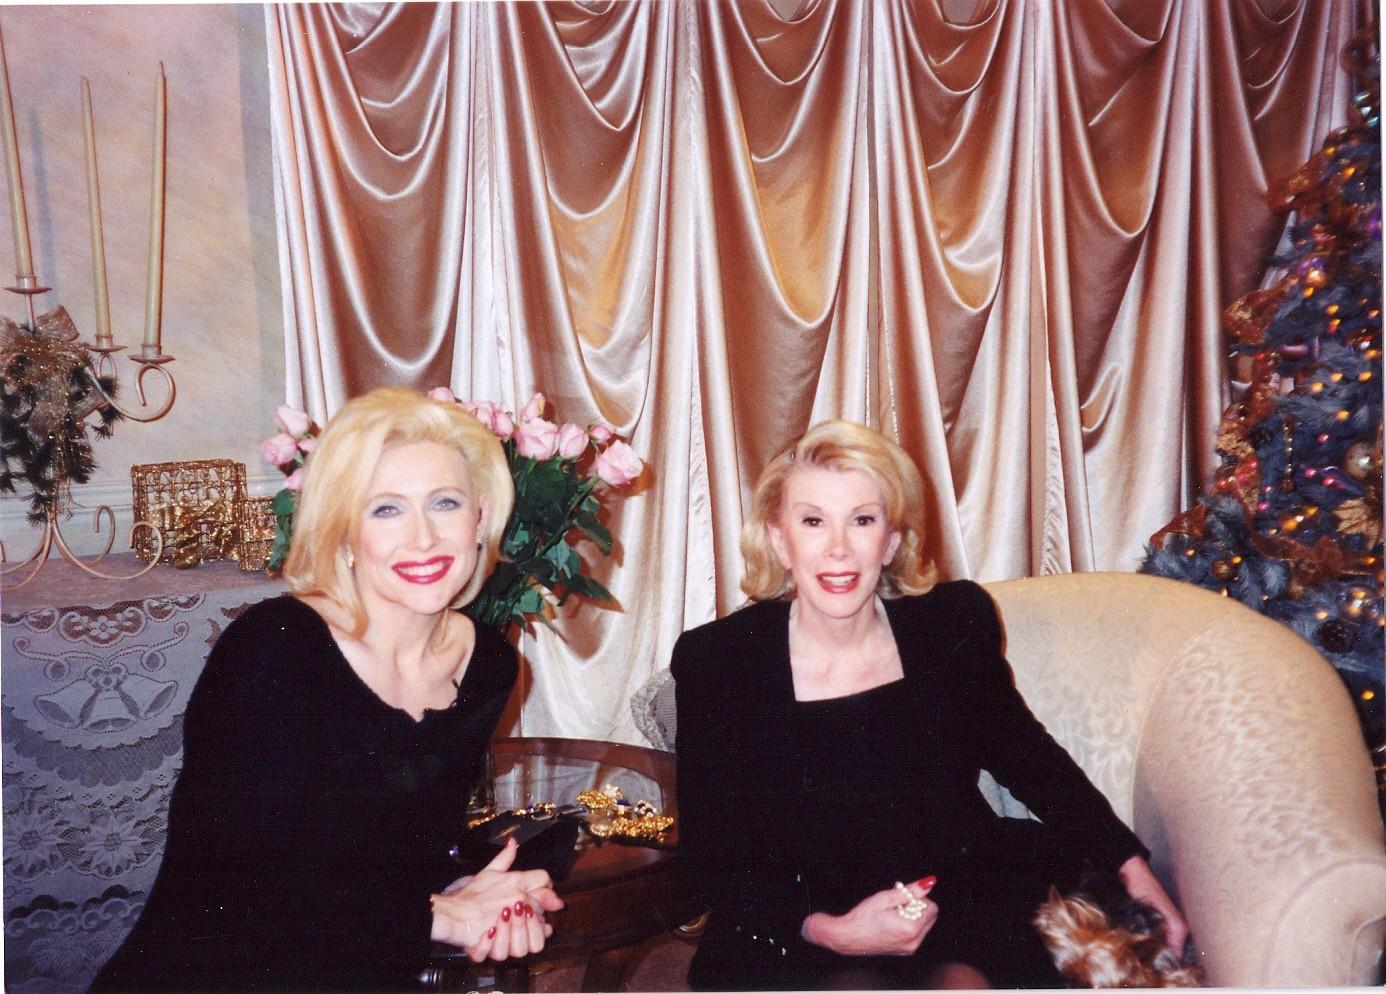 Kellie Olver and Joan Rivers